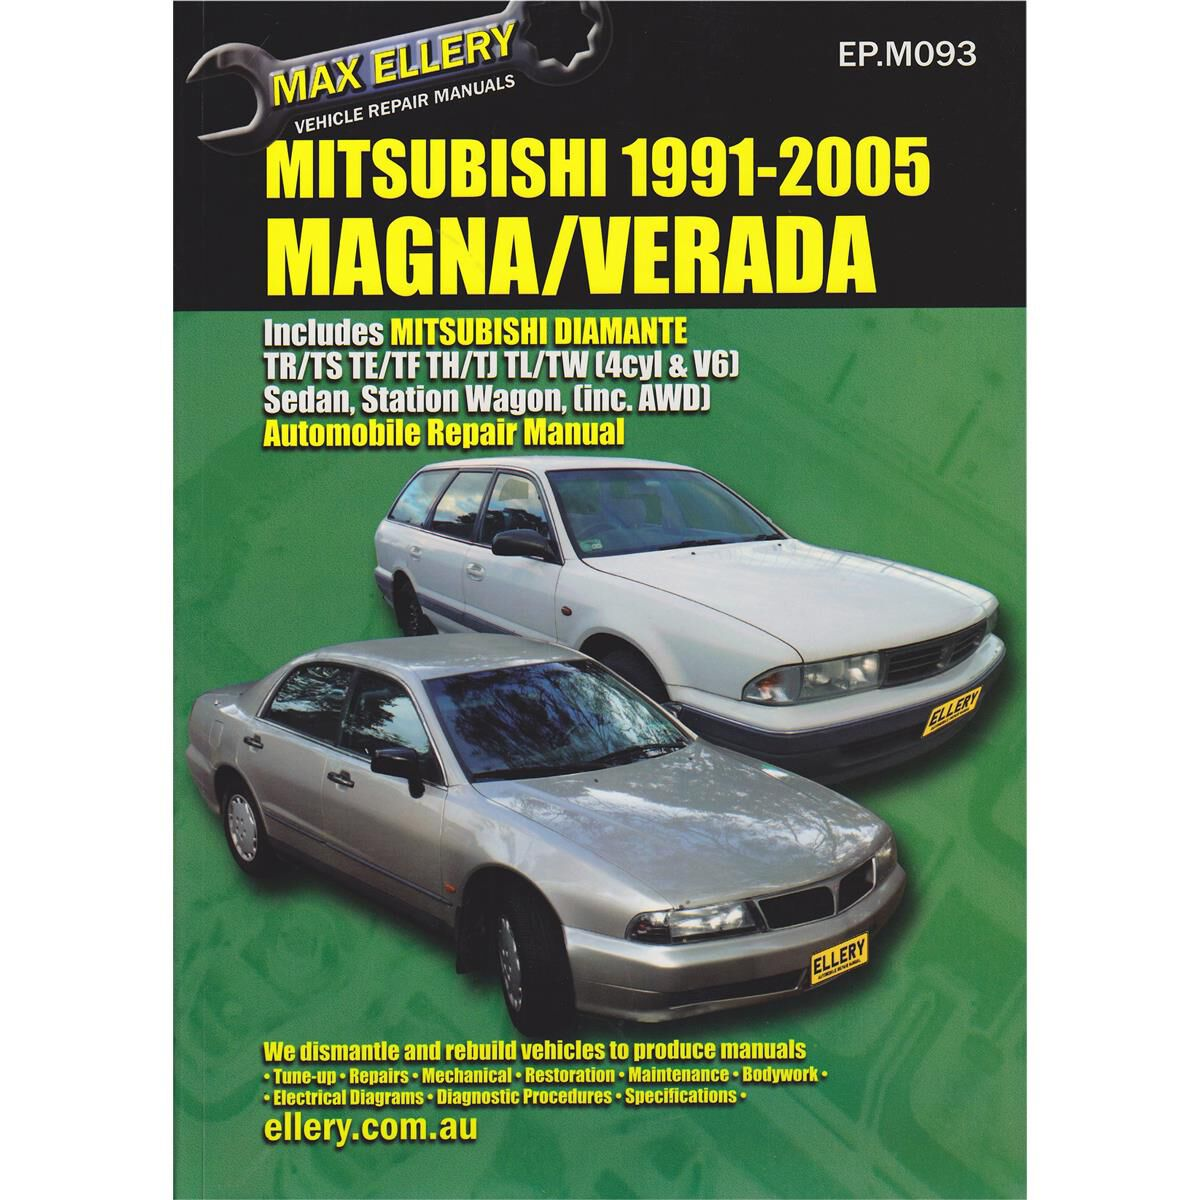 car manual for mitsubishi magna verada 1991 2005 ep m093 rh supercheapauto com au 1996 Mitsubishi Mighty Max Mitsubishi Magna 2003